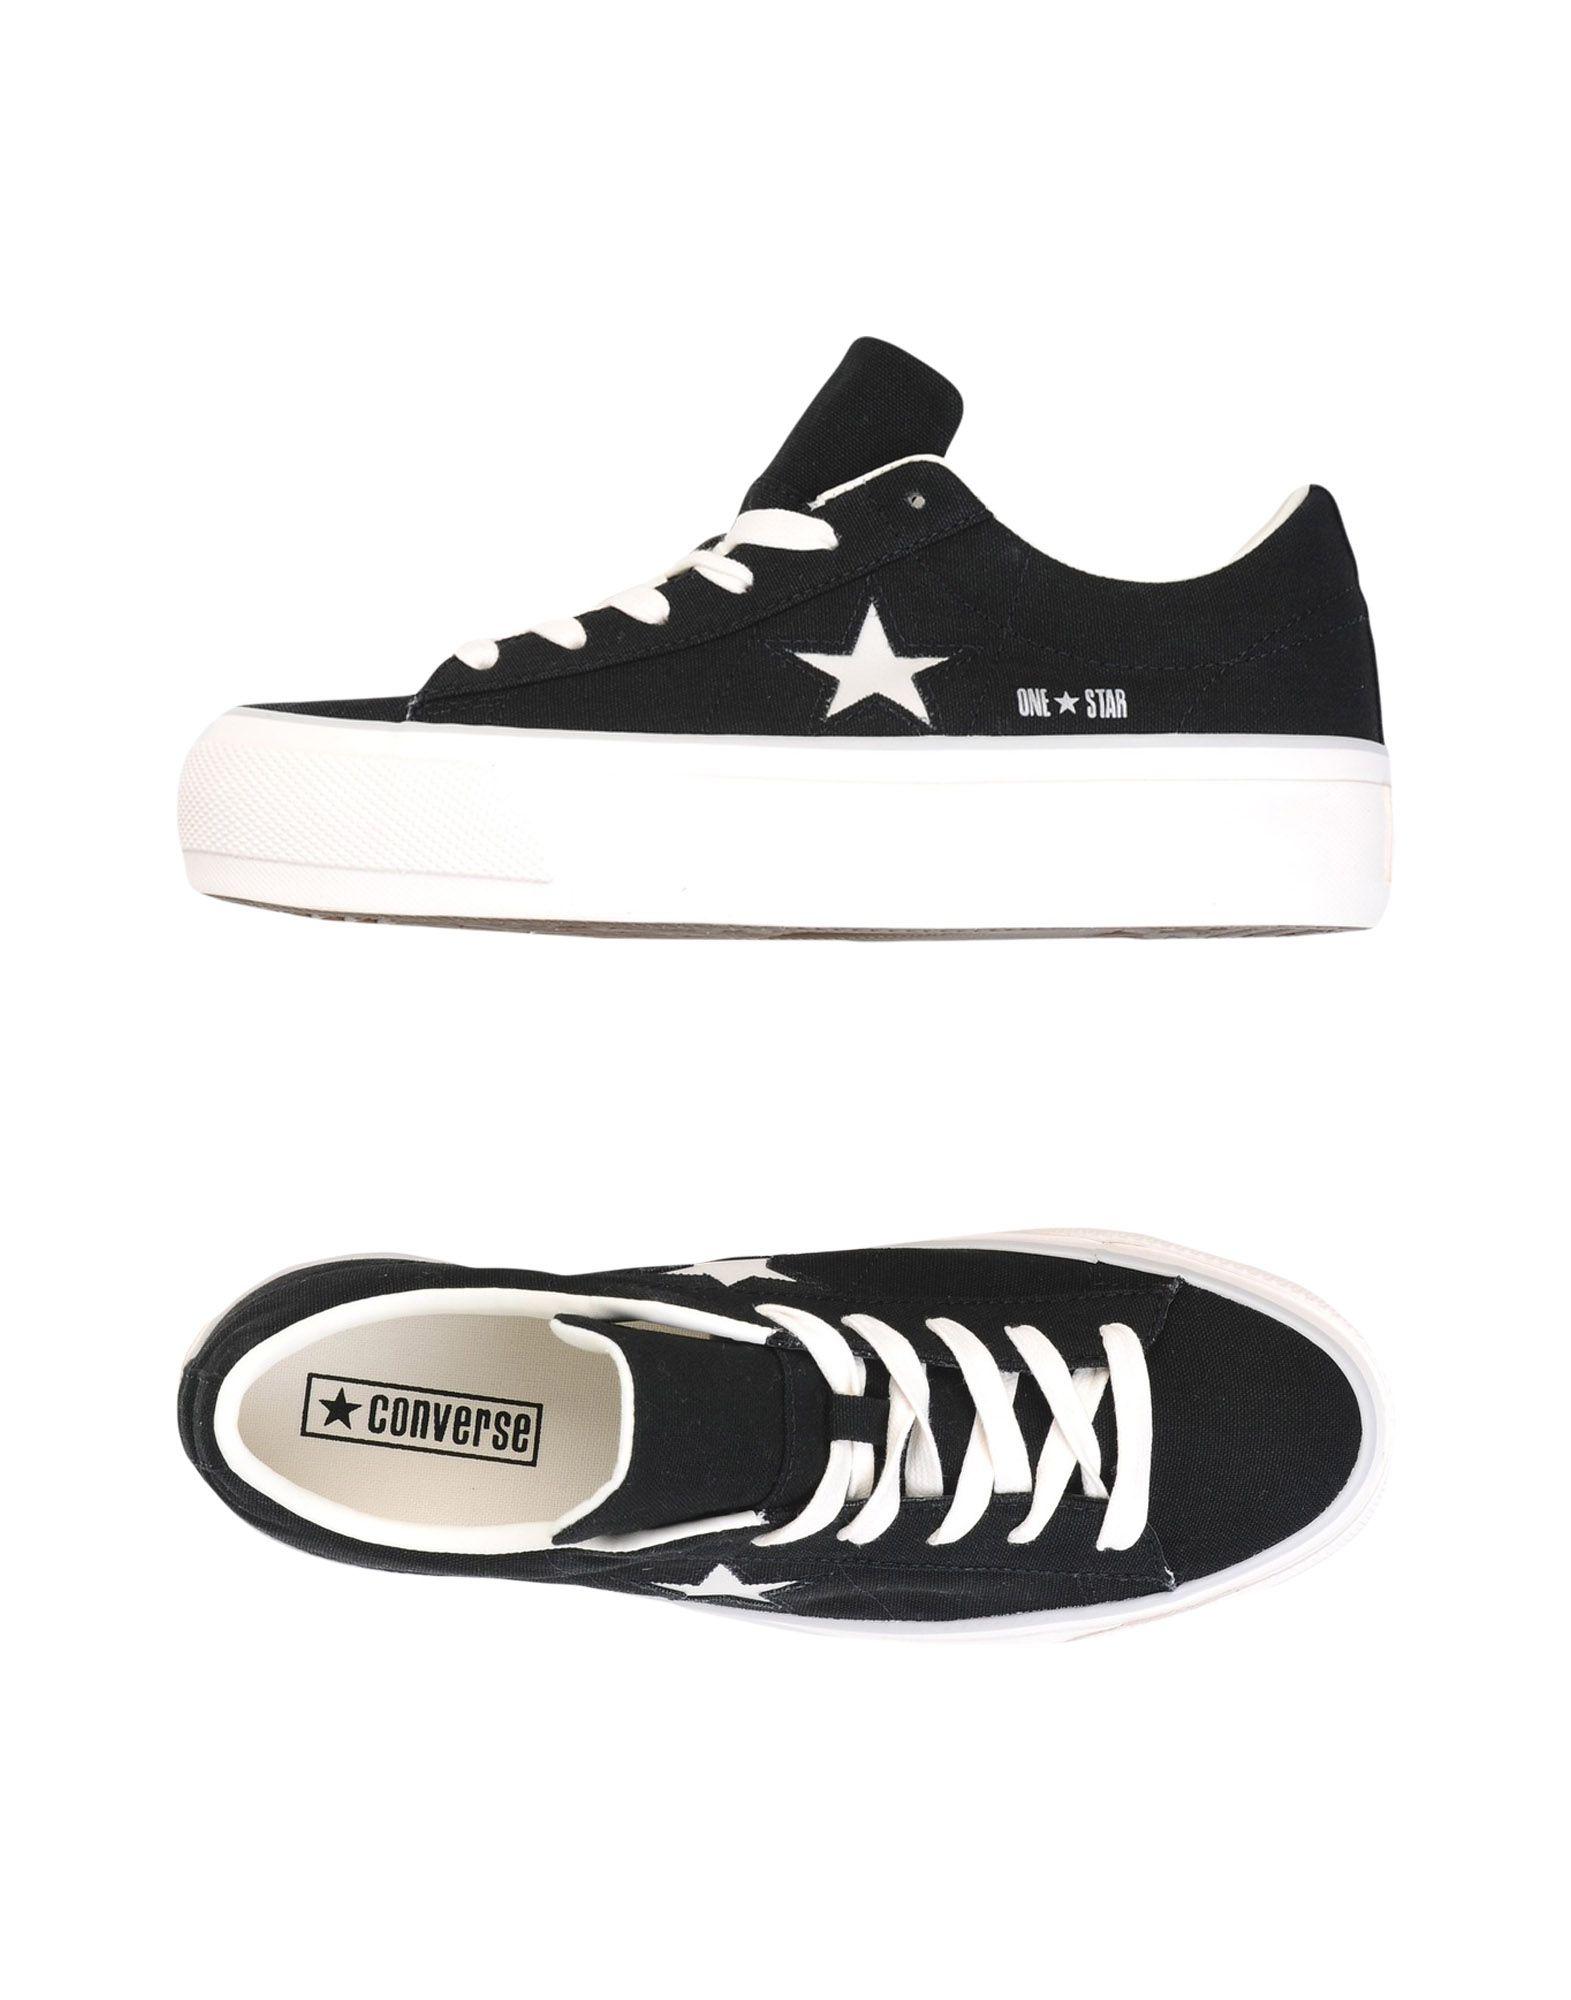 Scarpe da Ginnastica Star Converse All Star One Star Ginnastica Platform Ox Glitter Canvas - Donna - 11461363DR c2e6cb